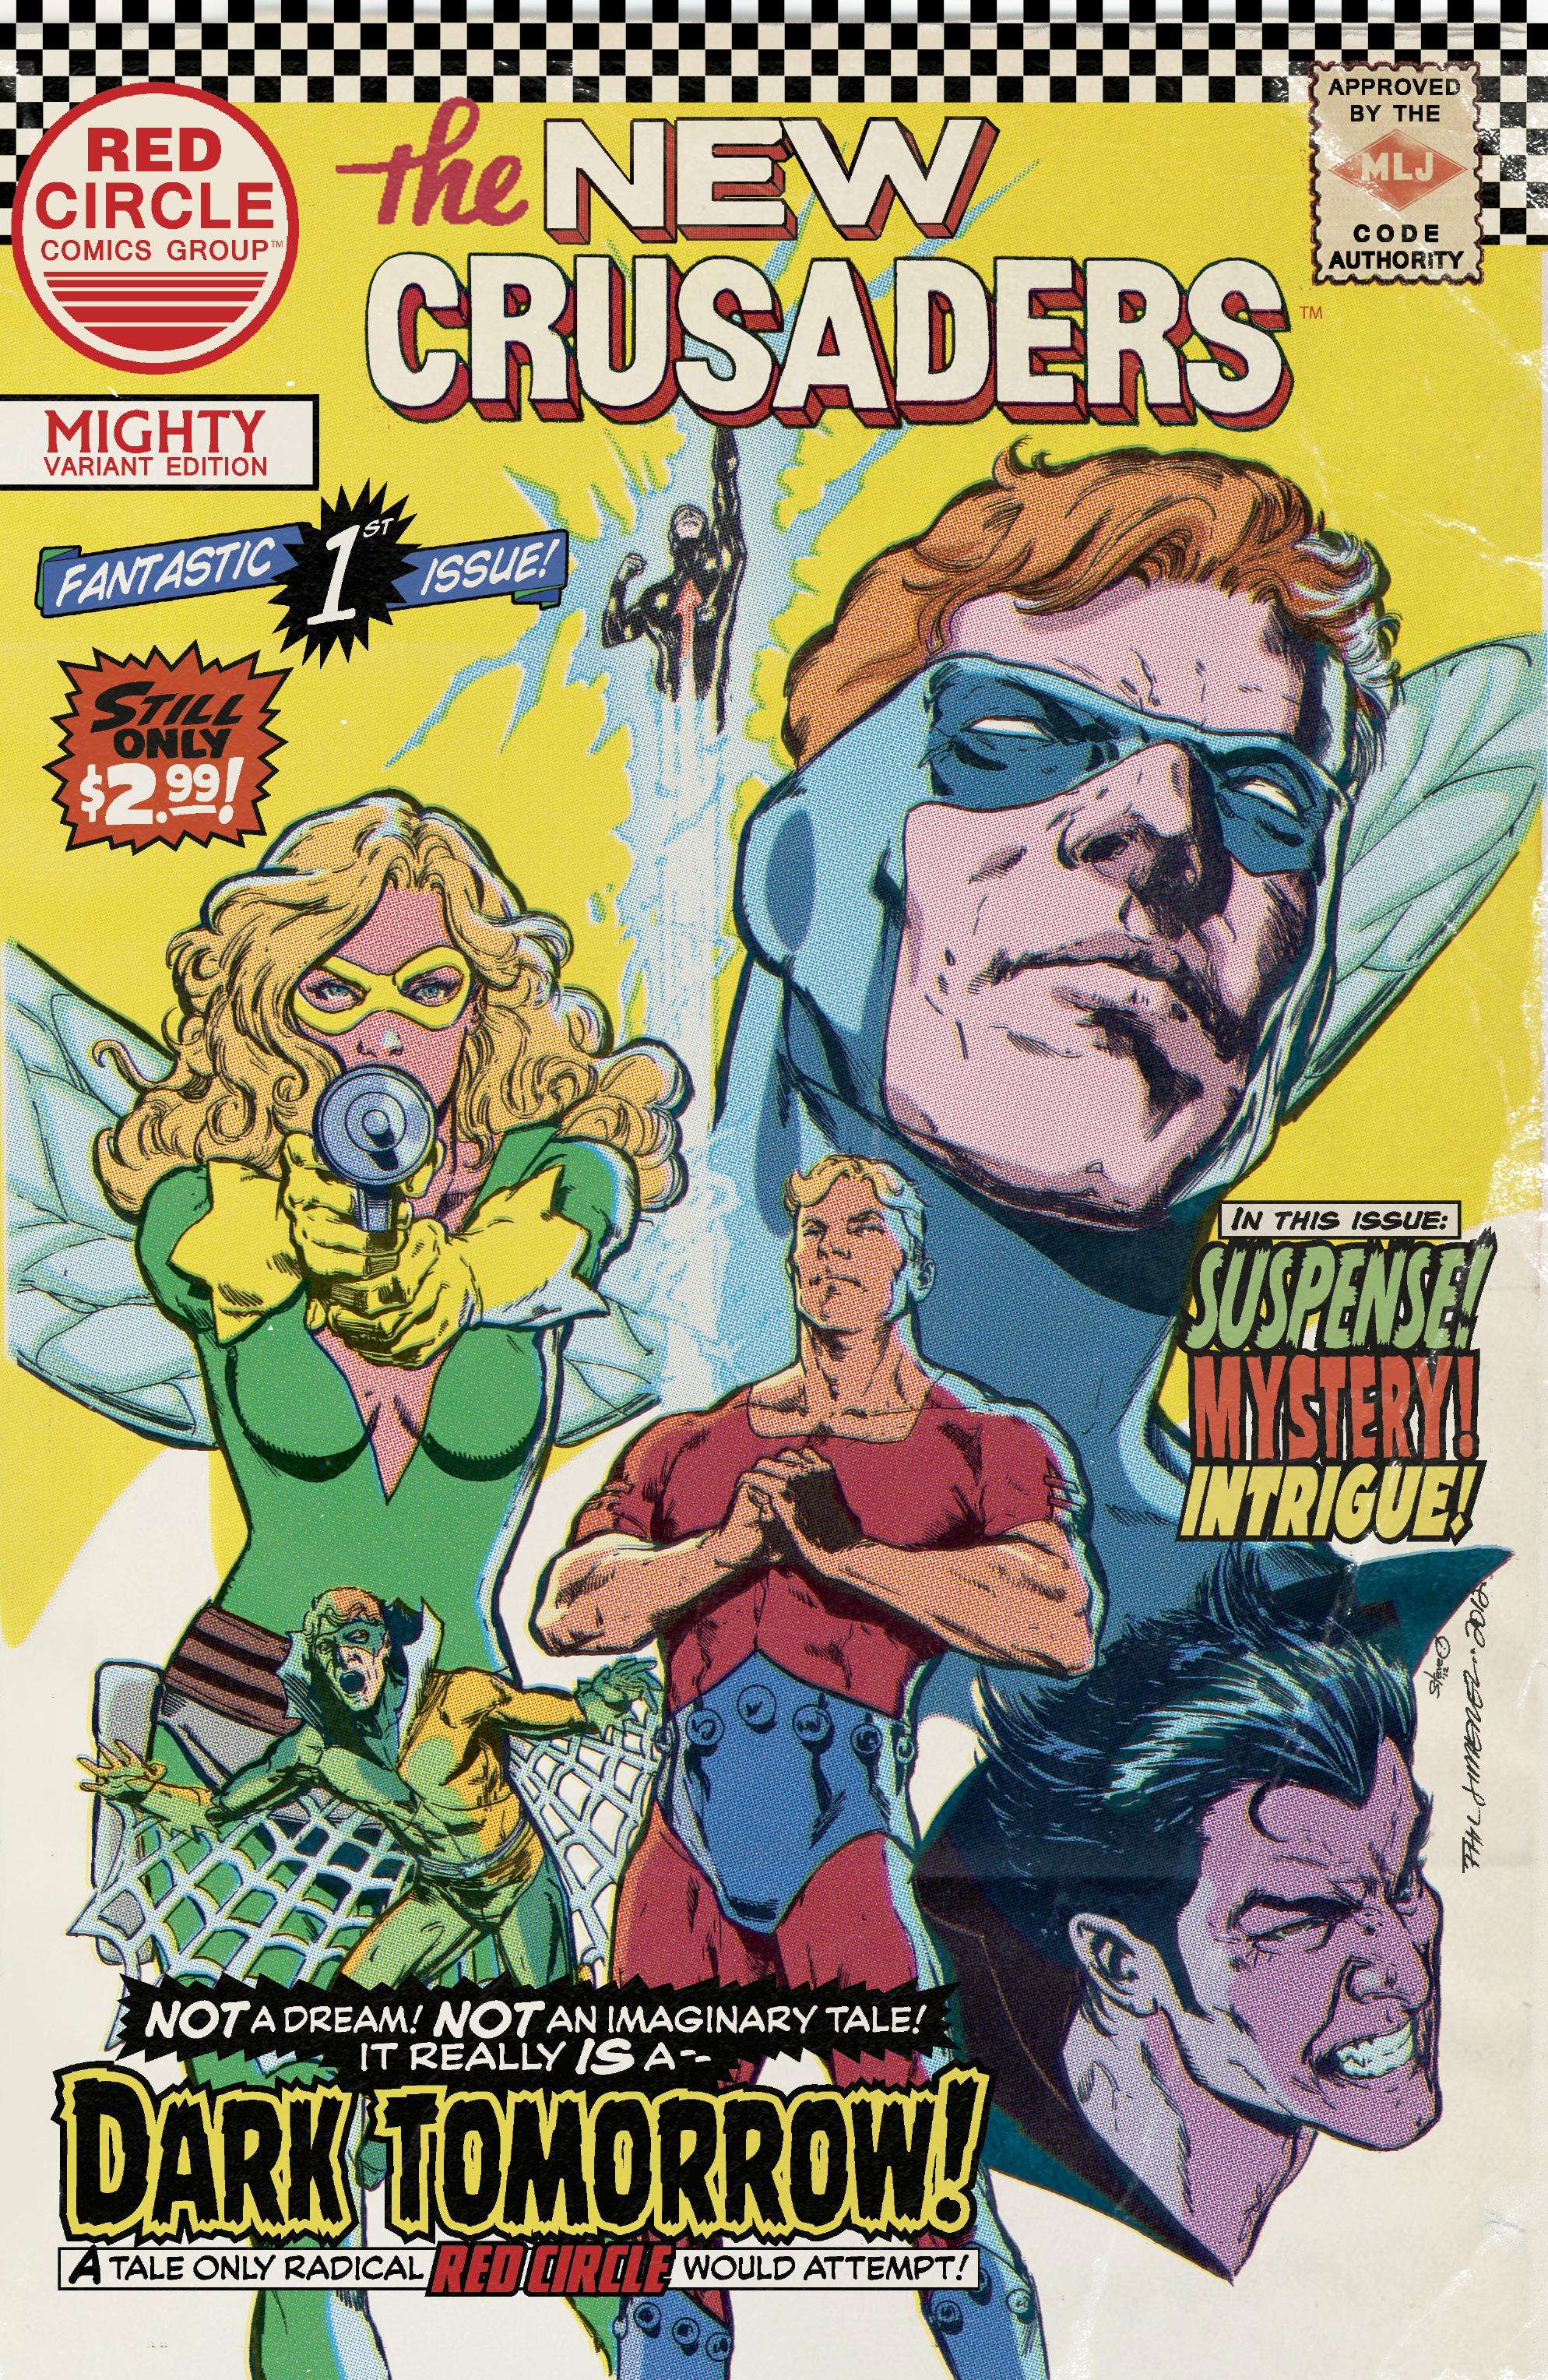 Archie comics archie comics sneak peek of the week major spoilers - Newcrusdtretrovar 1